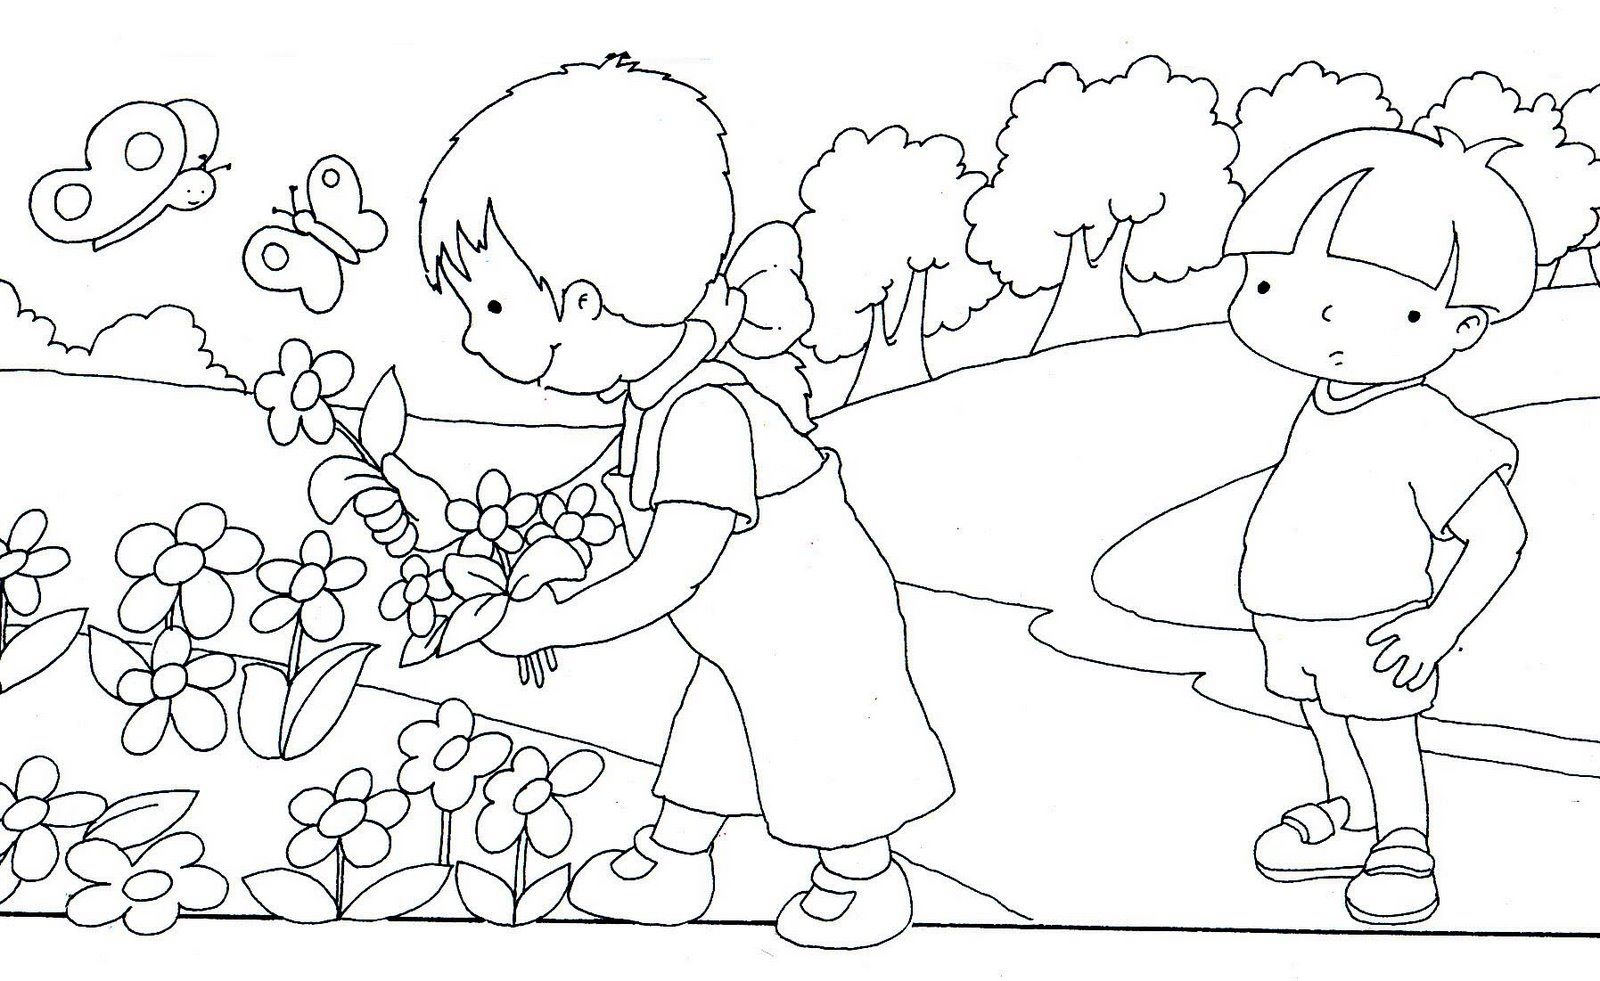 Famoso Naturaleza Para Colorear Imágenes Componente - Dibujos Para ...